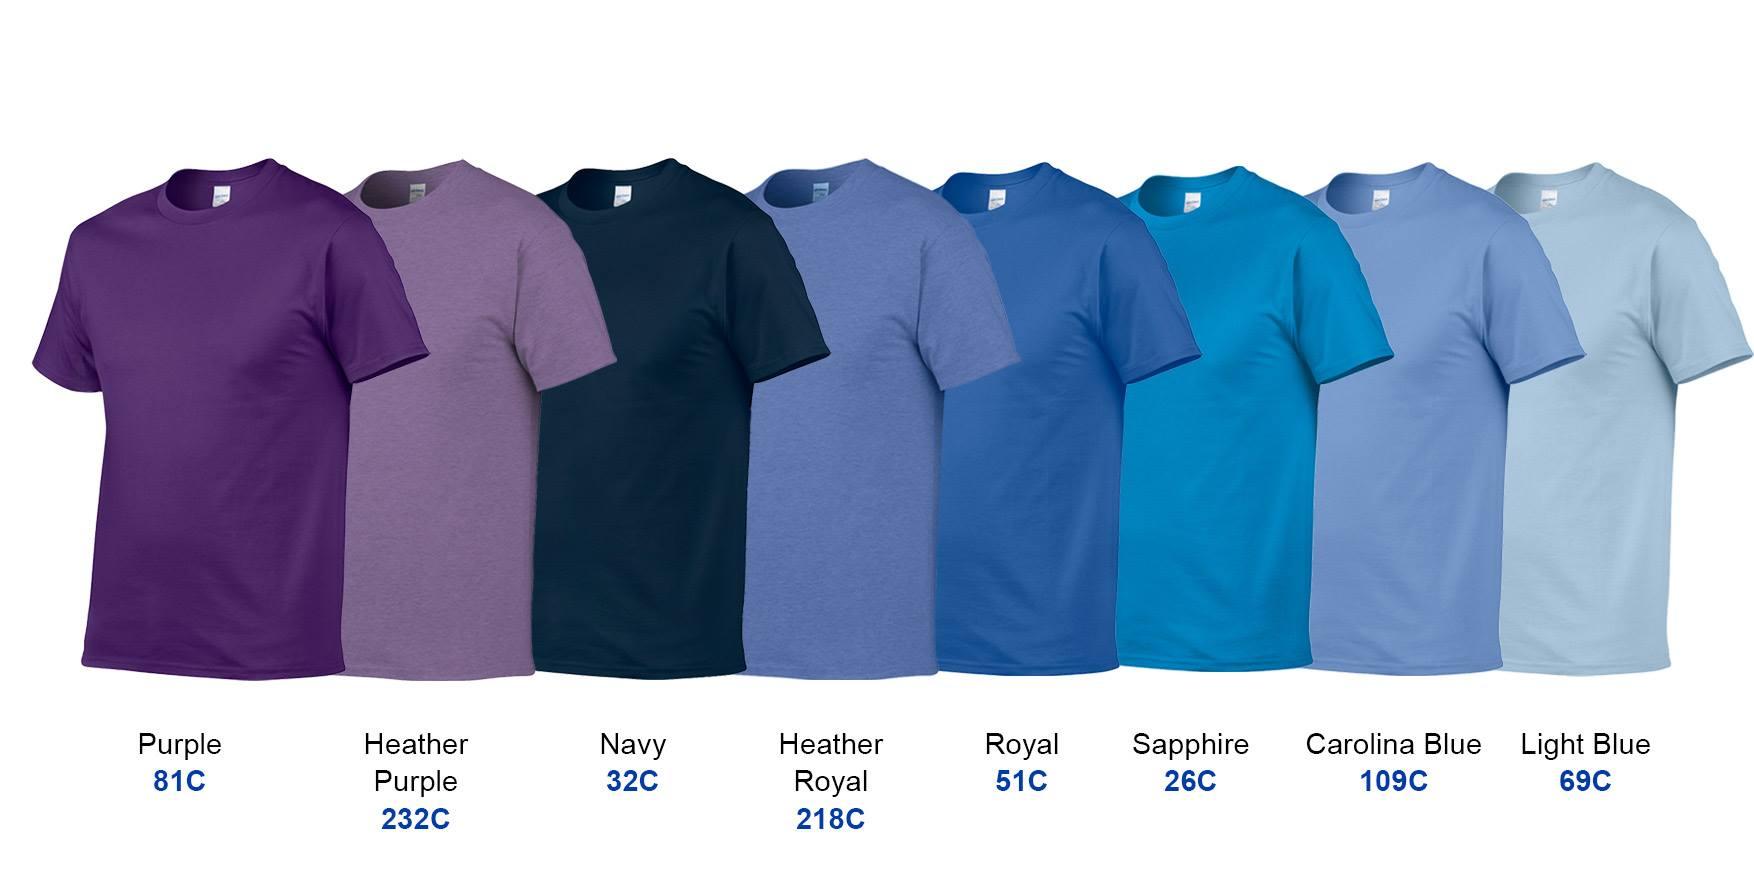 e70b966e84 Gildan Premium Cotton 76000 T-Shirt (Heather Purple &Carolina Blue)